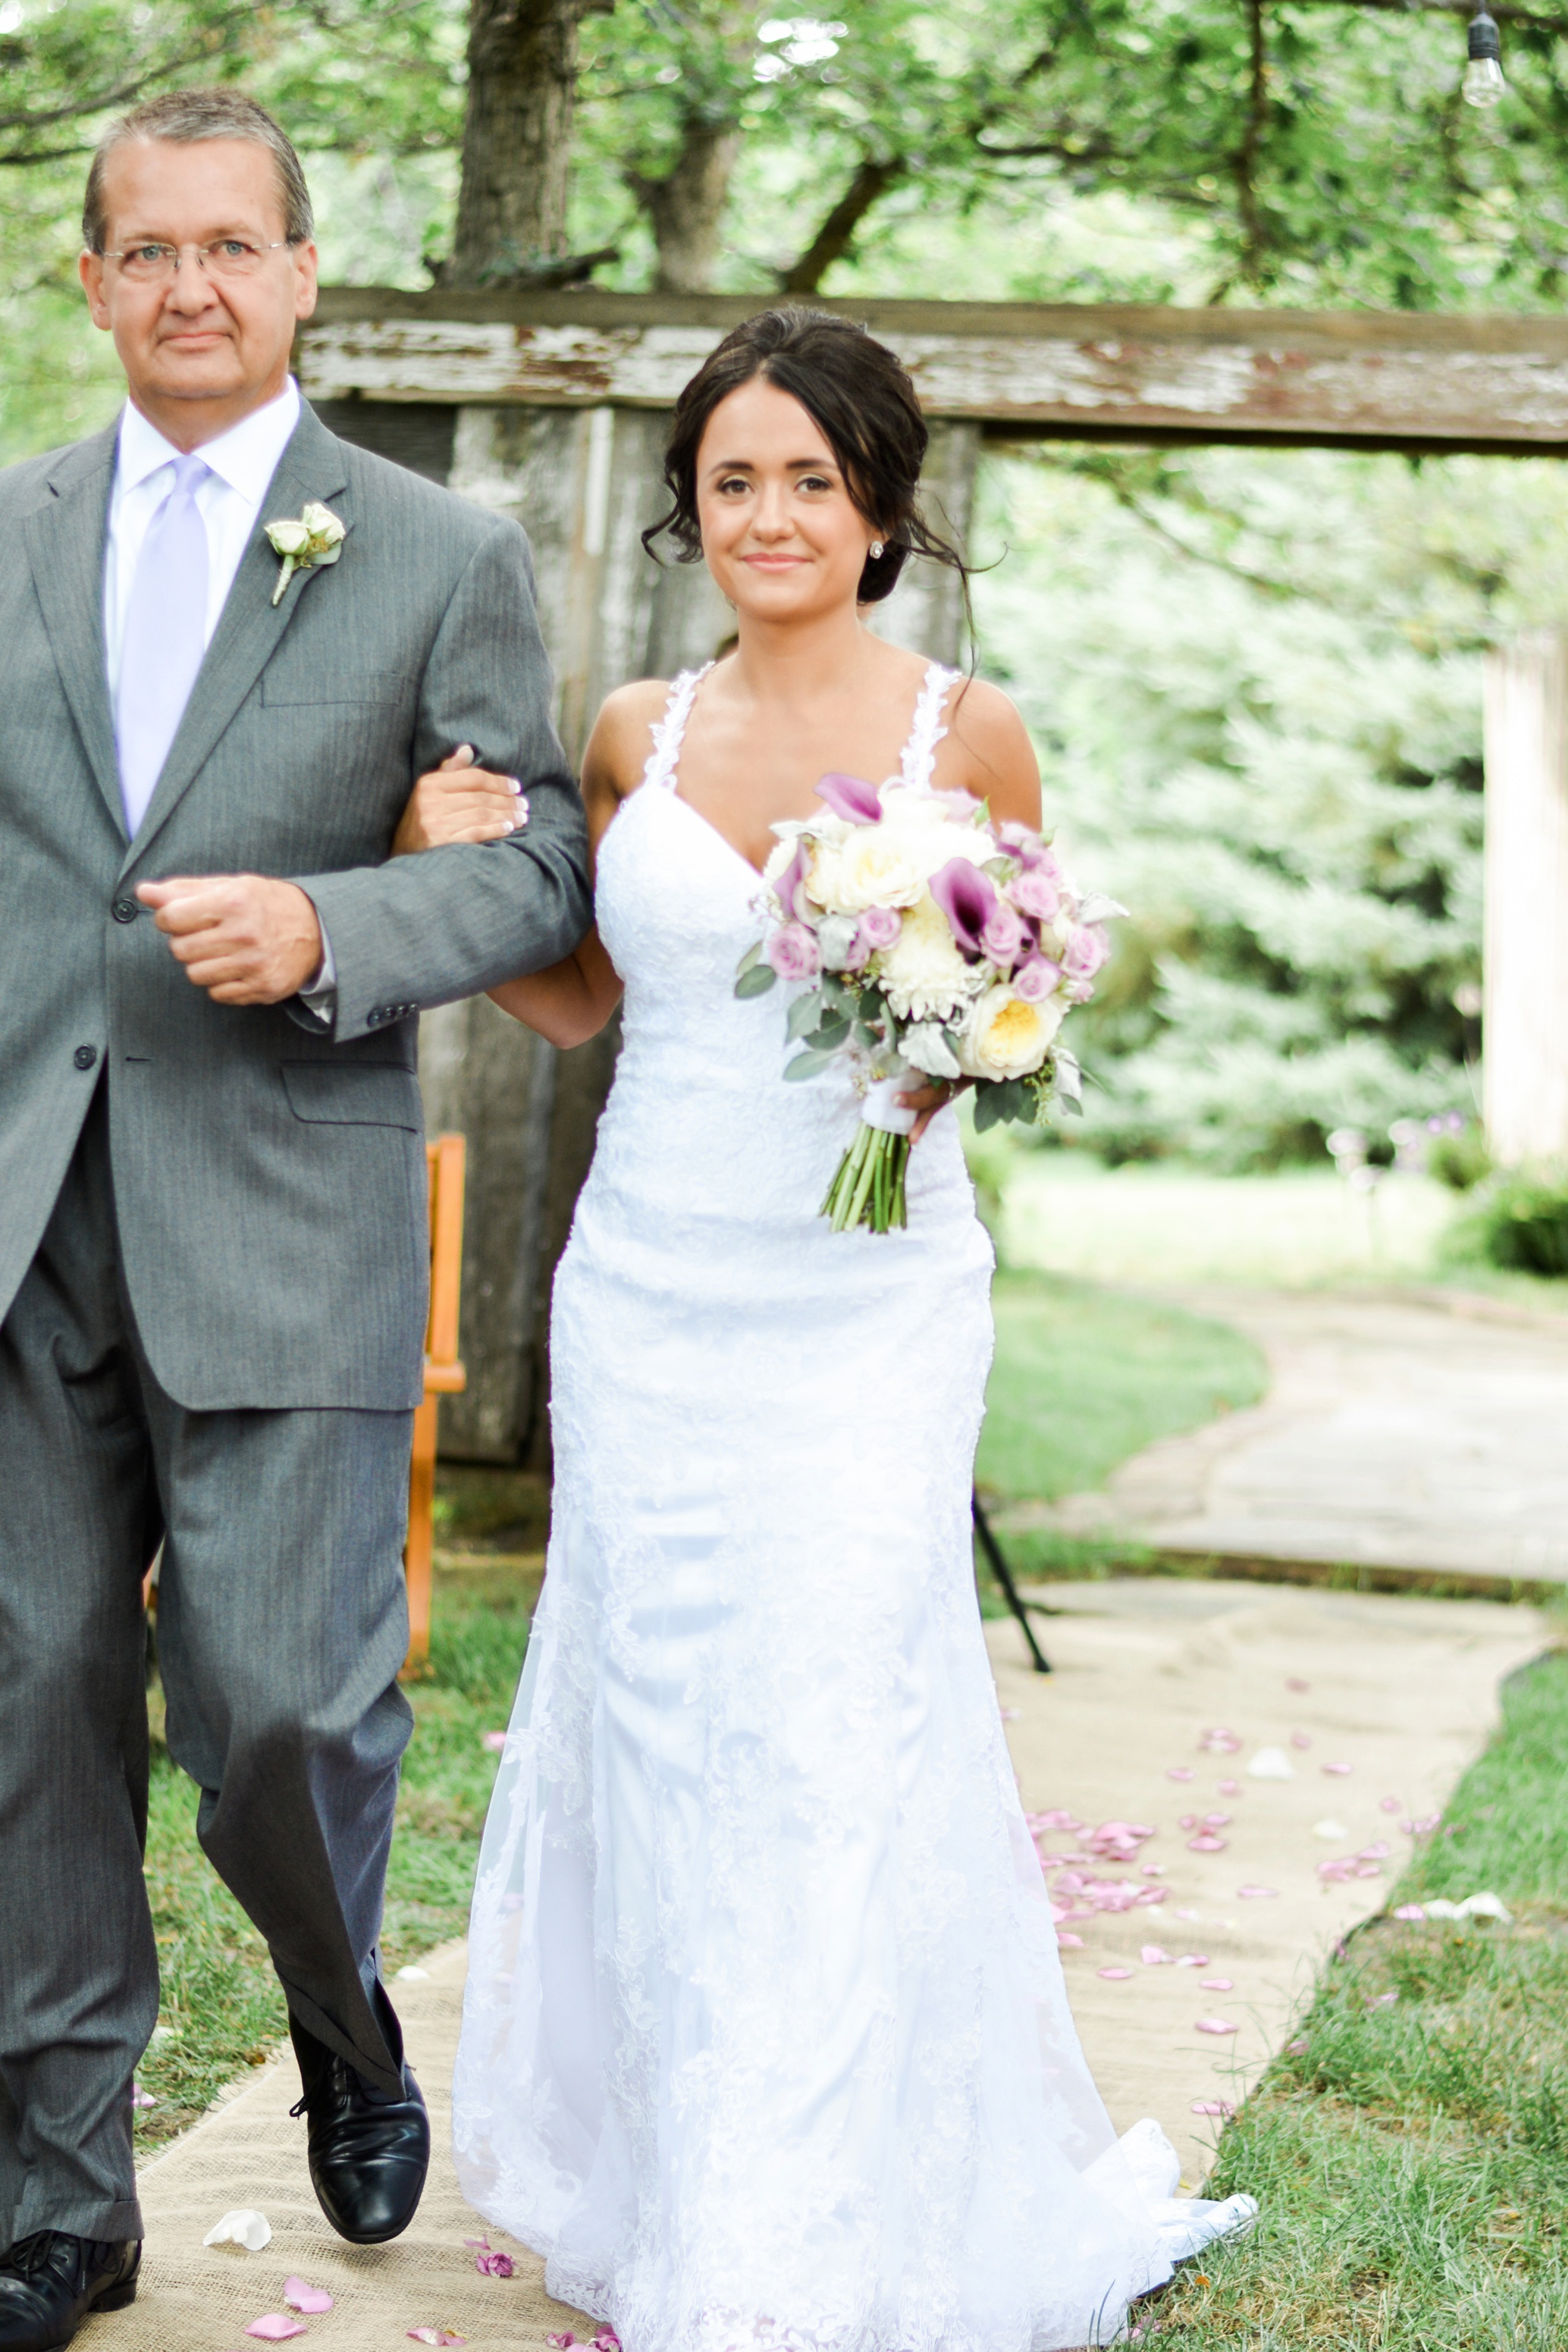 Barnes' Place Rustic Outdoor Wedding | Ali Leigh Photo Minneapolis Wedding Photographer_0110.jpg